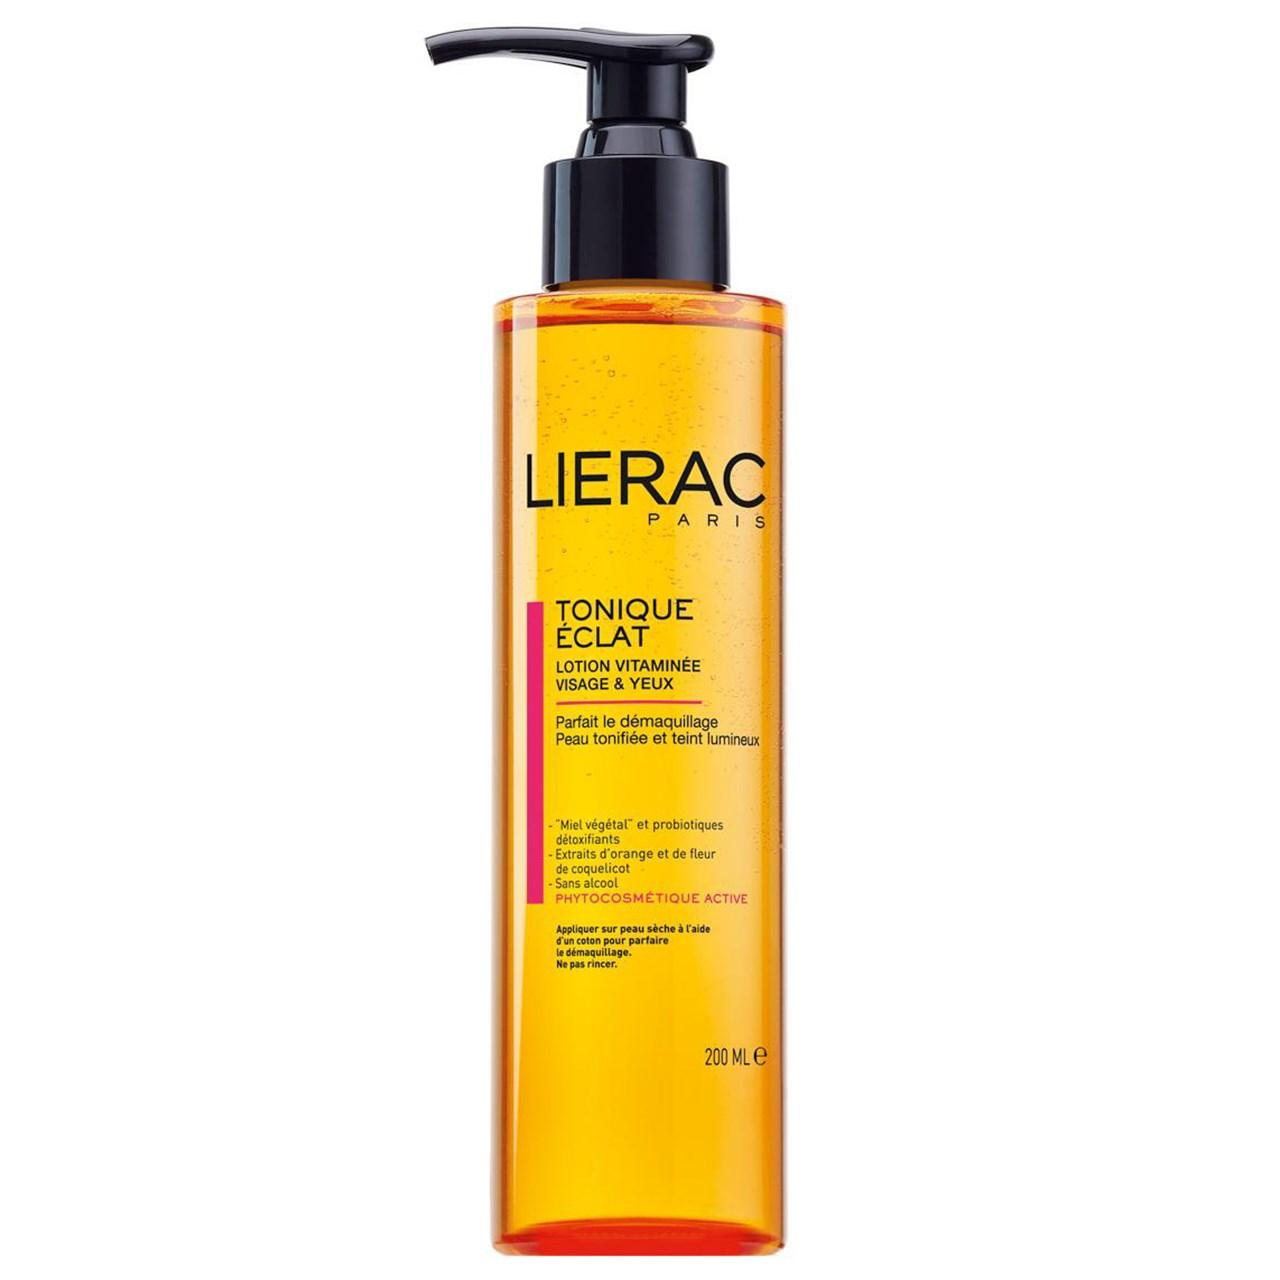 لوسیون پاک کننده لیراک مدل Tonique Eclat Vitamin Soin حجم 200 میلی لیتر